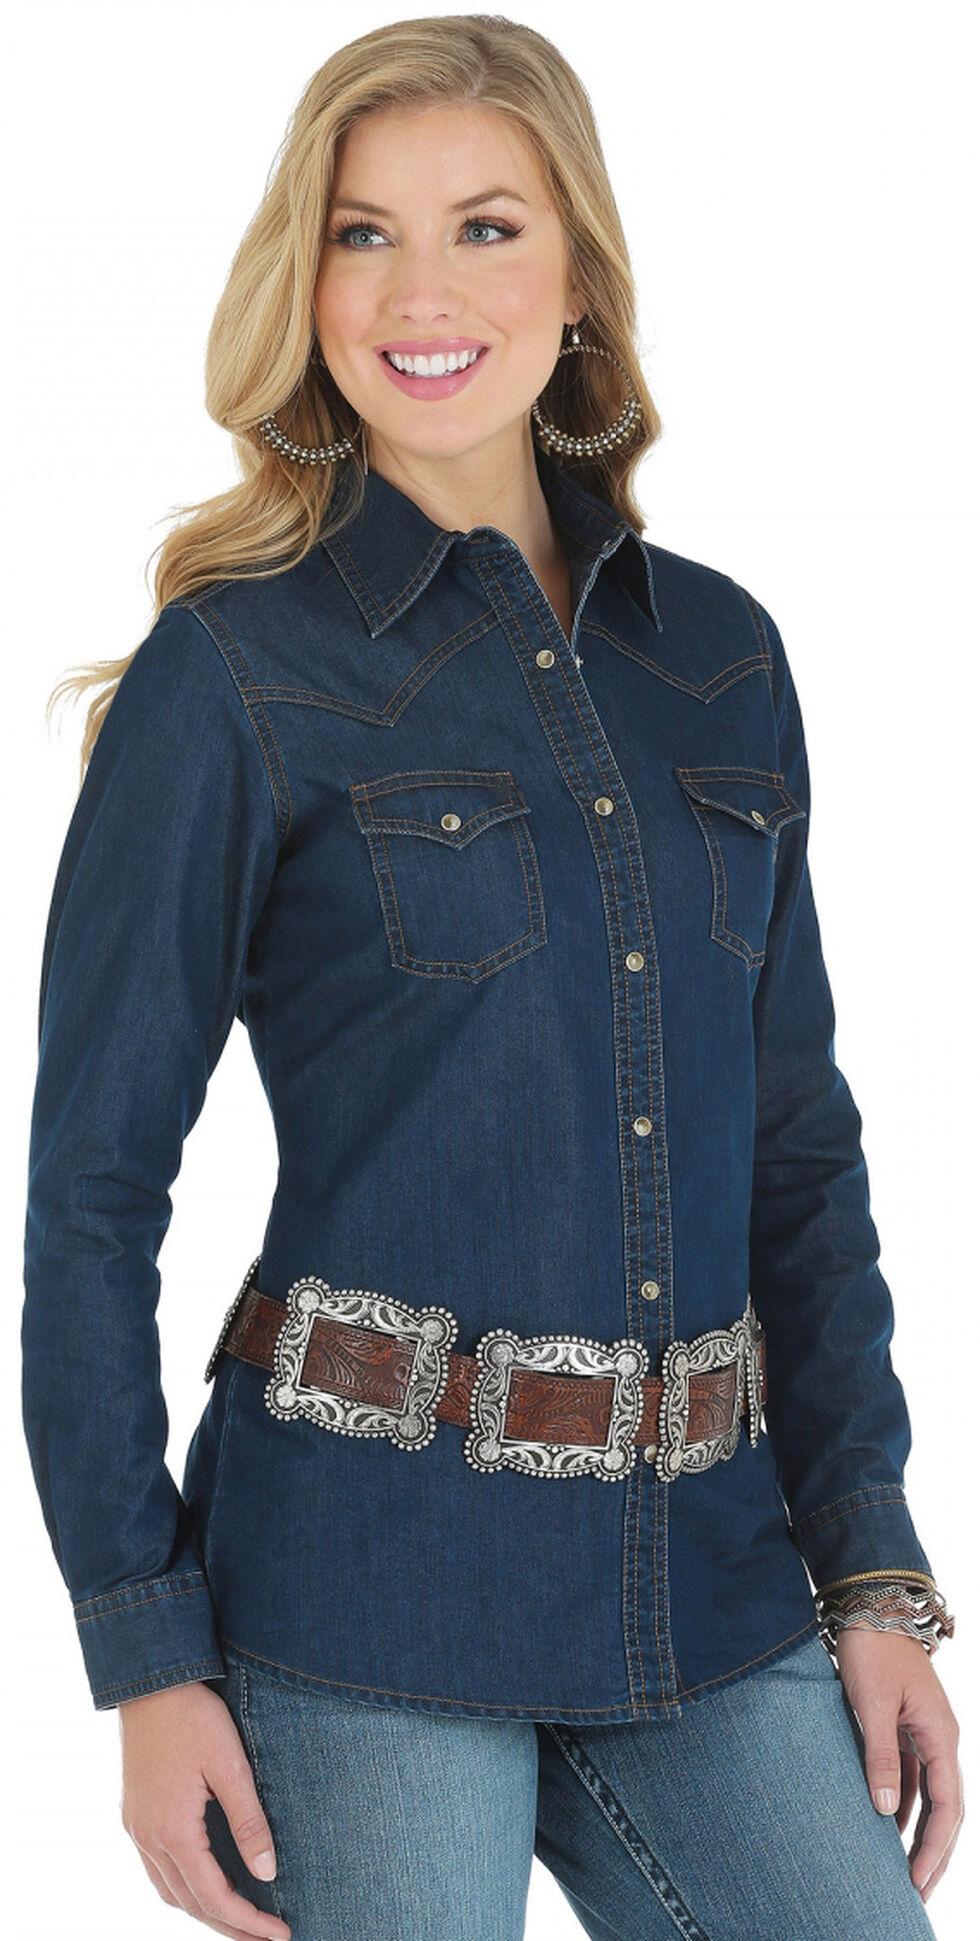 Wrangler Women's Denim Western Yoke Long Sleeve Shirt, Dark Denim, hi-res